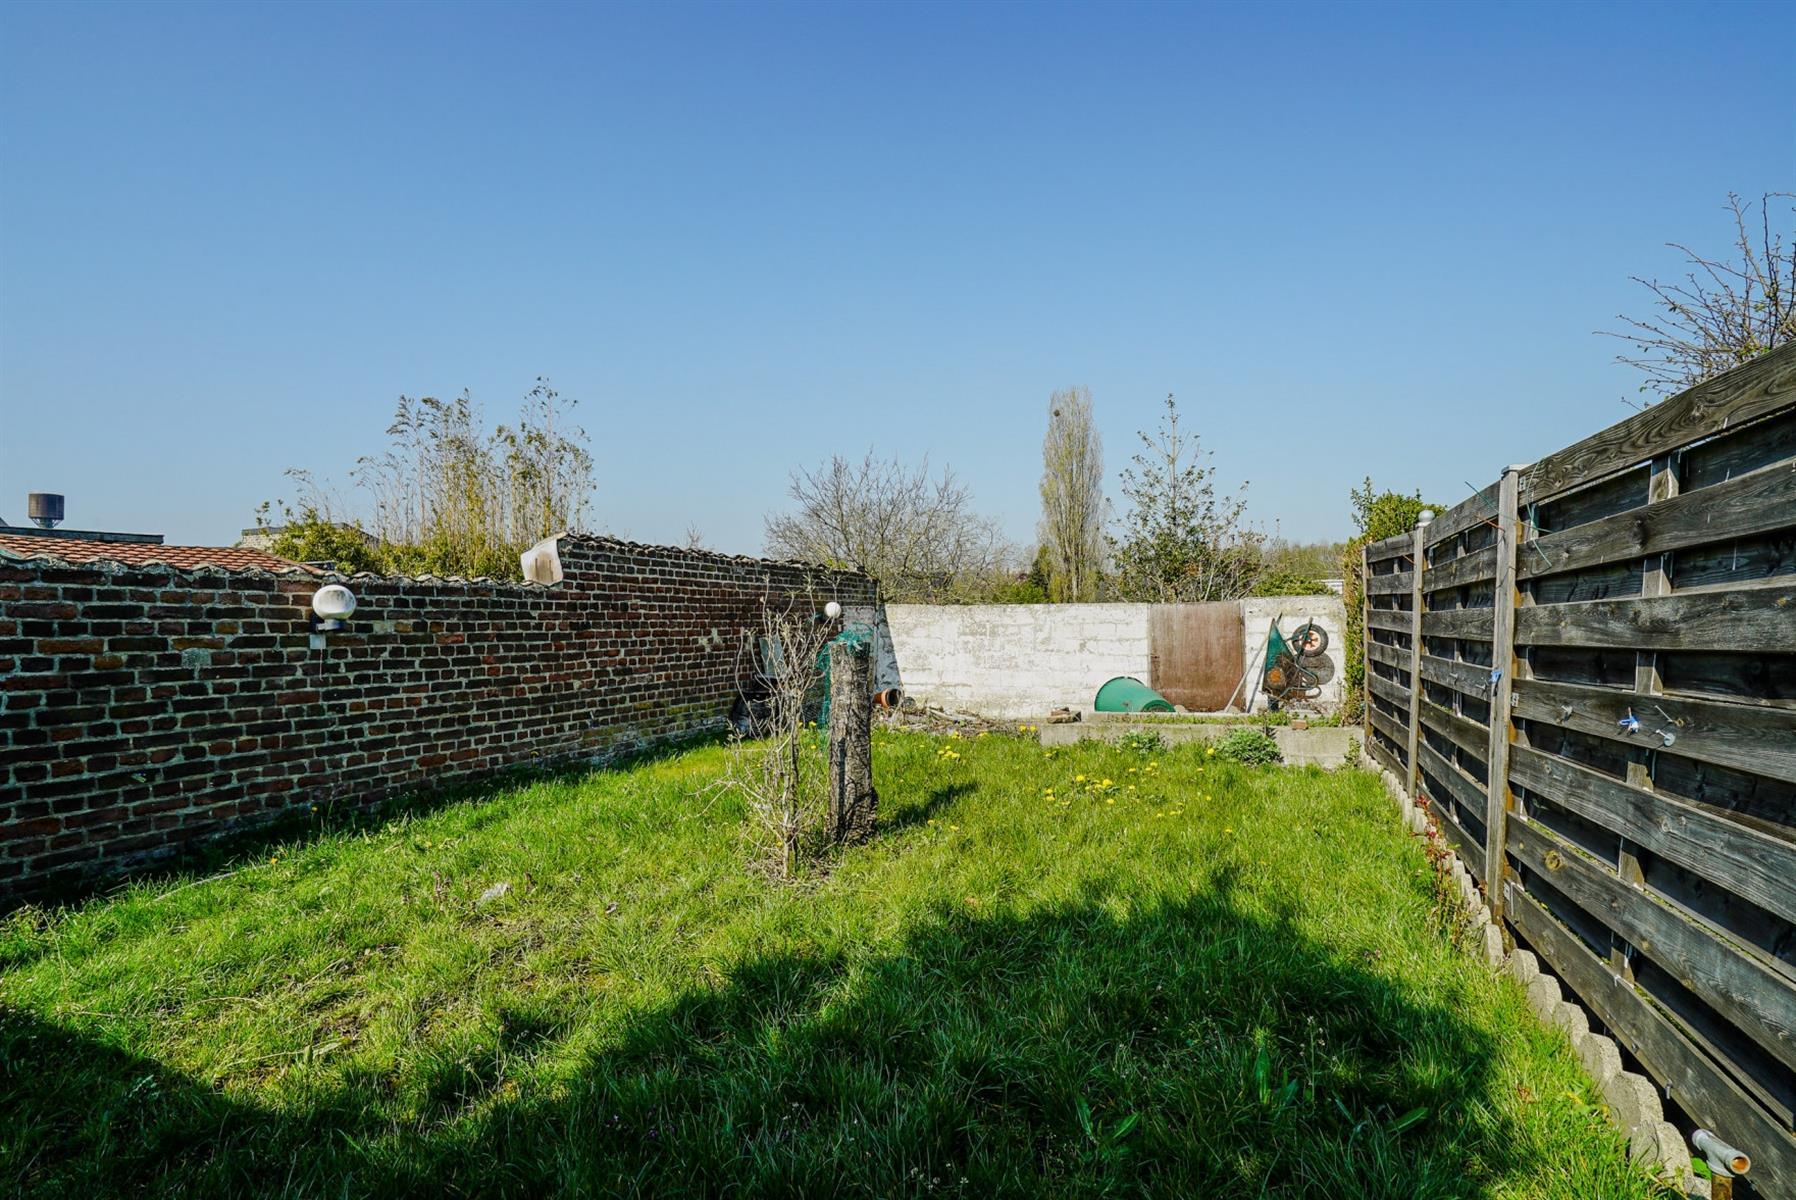 Maison - Oupeye Hermallesous-Argenteau - #4324098-12